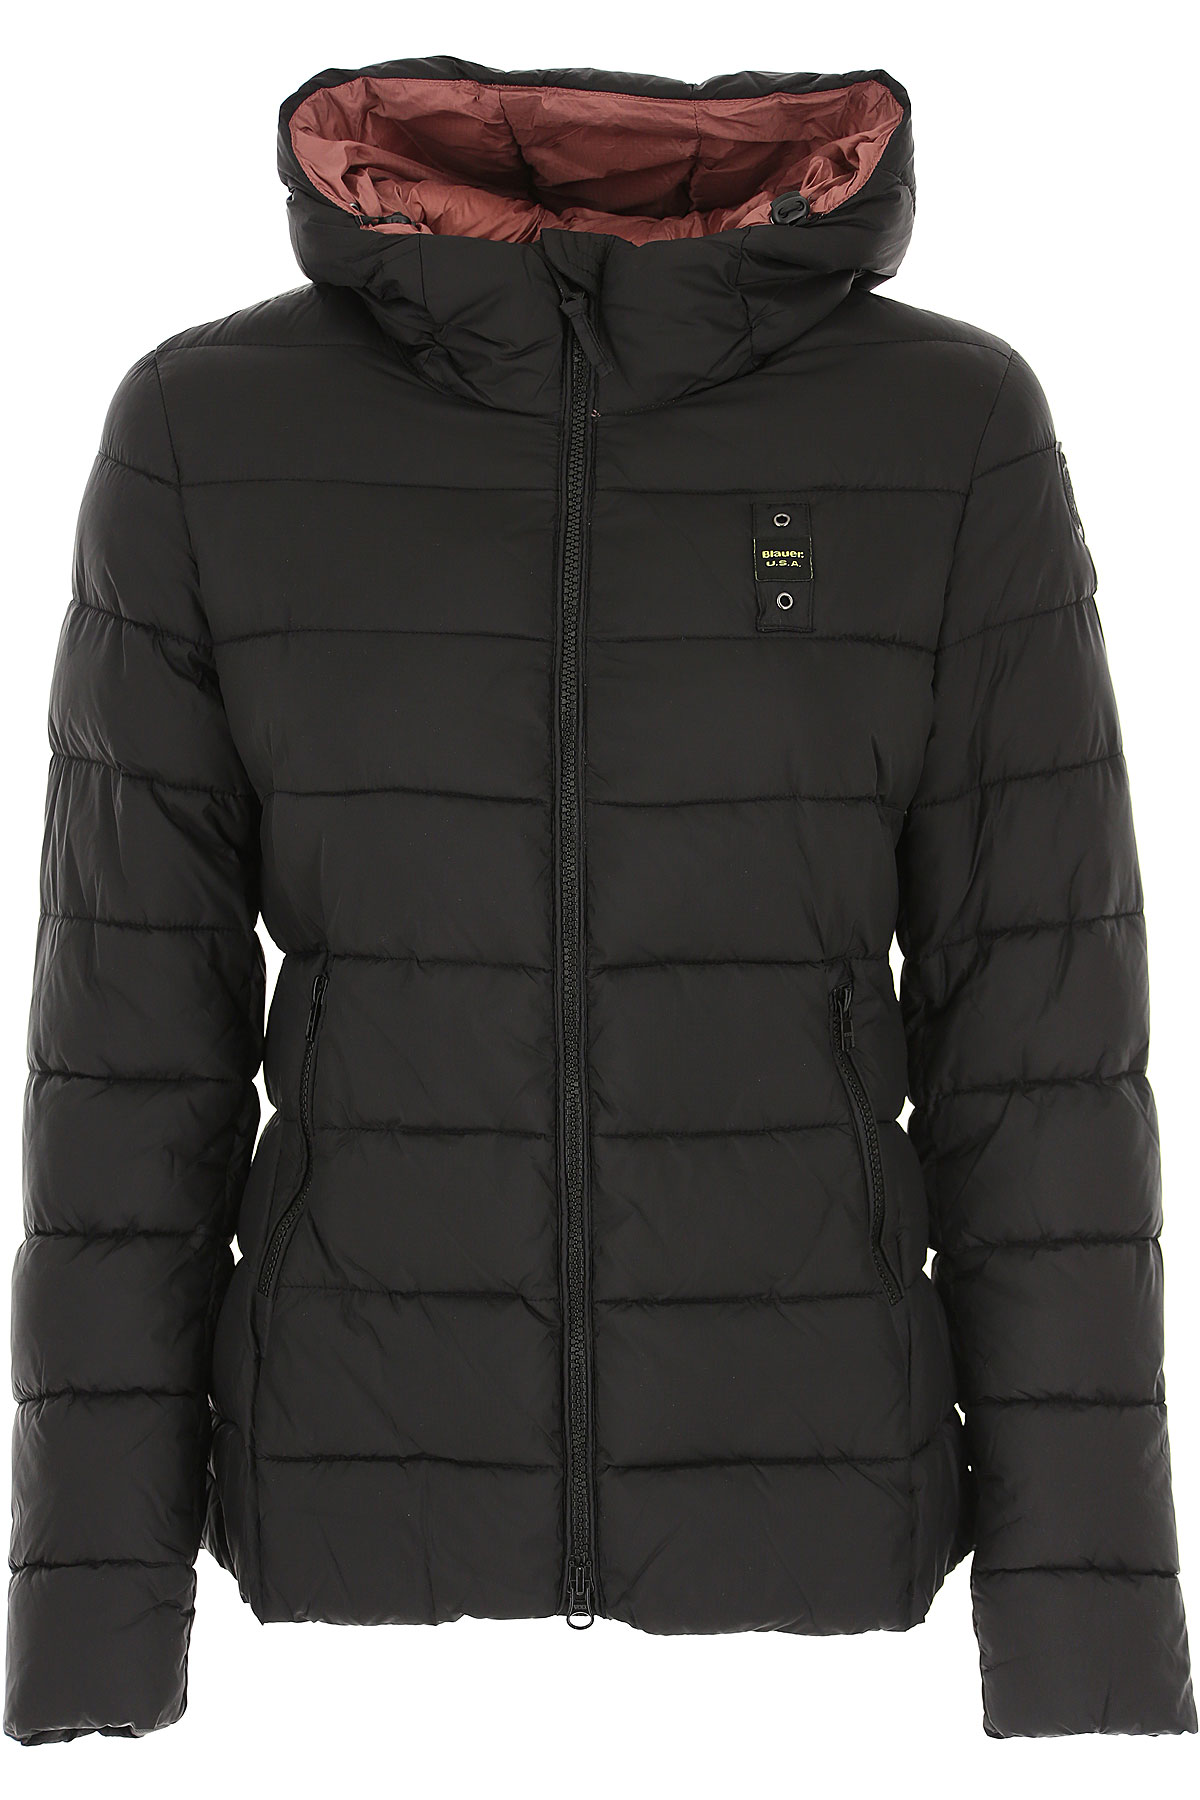 Blauer Down Jacket for Women, Puffer Ski Jacket On Sale, Black, polyester, 2019, 4 M S